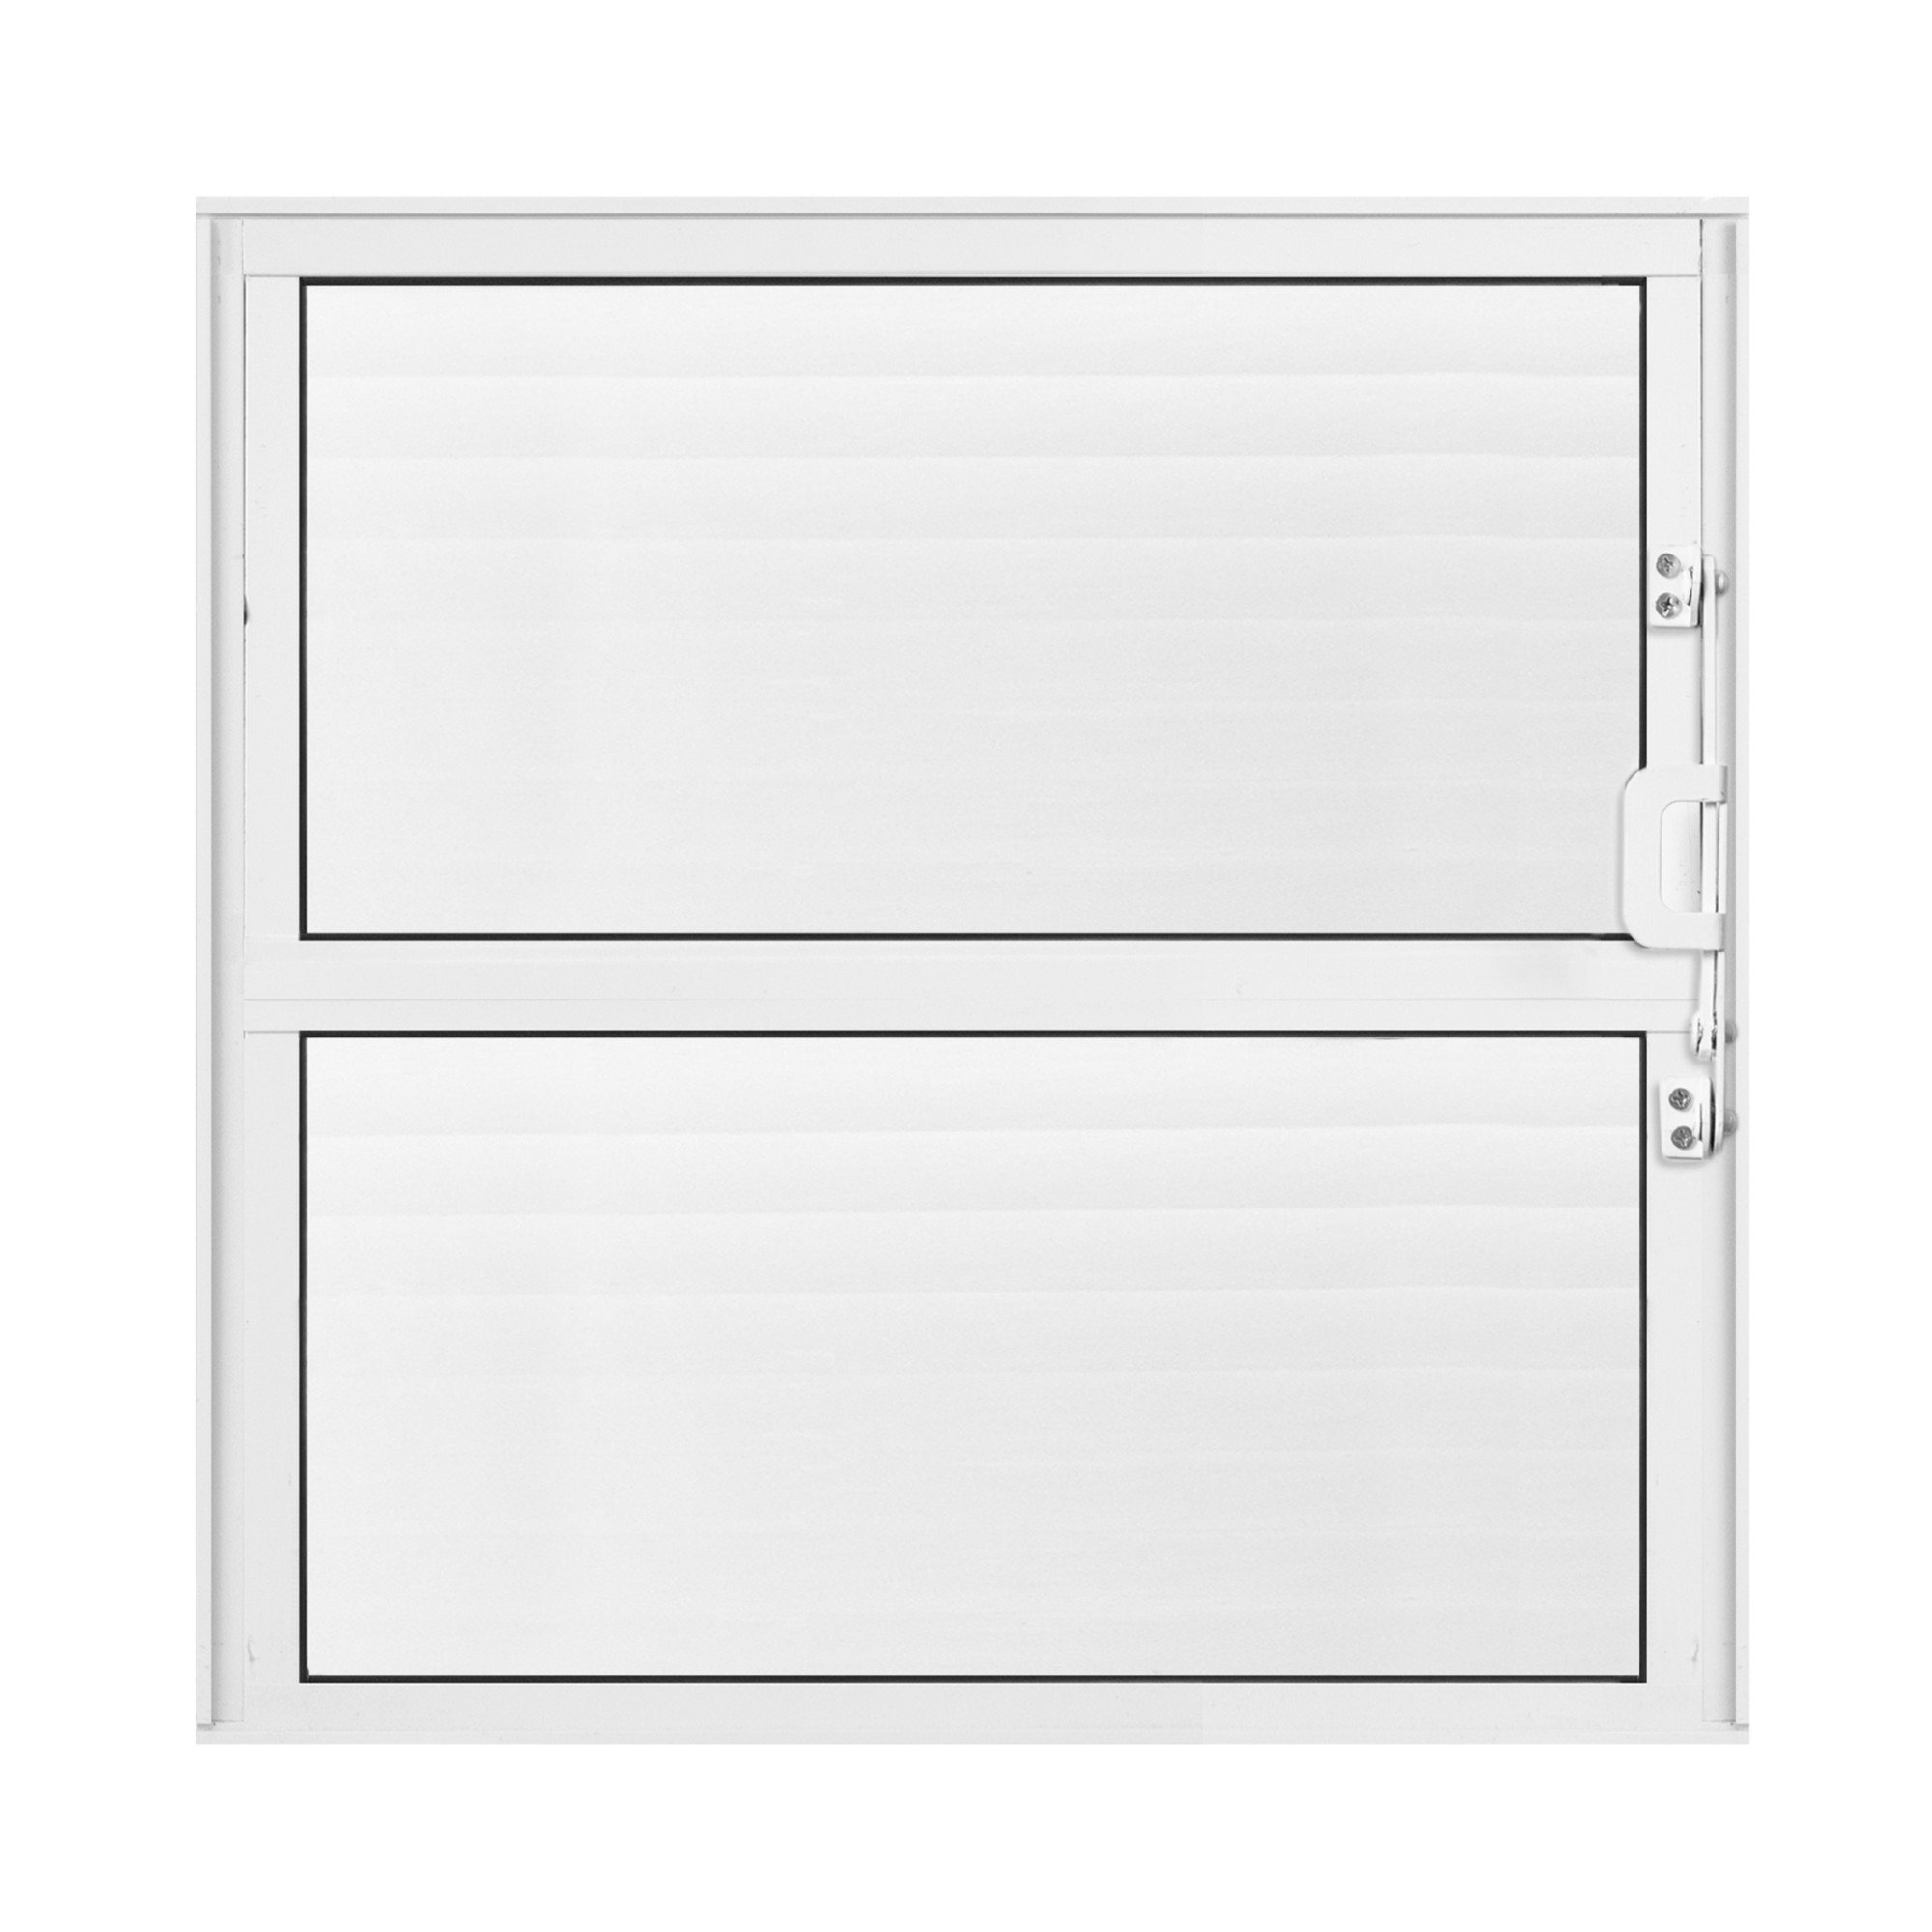 Janela de Abrir Basculante de Aluminio Vidro Canelado 40x40 cm Branco - Aluvid